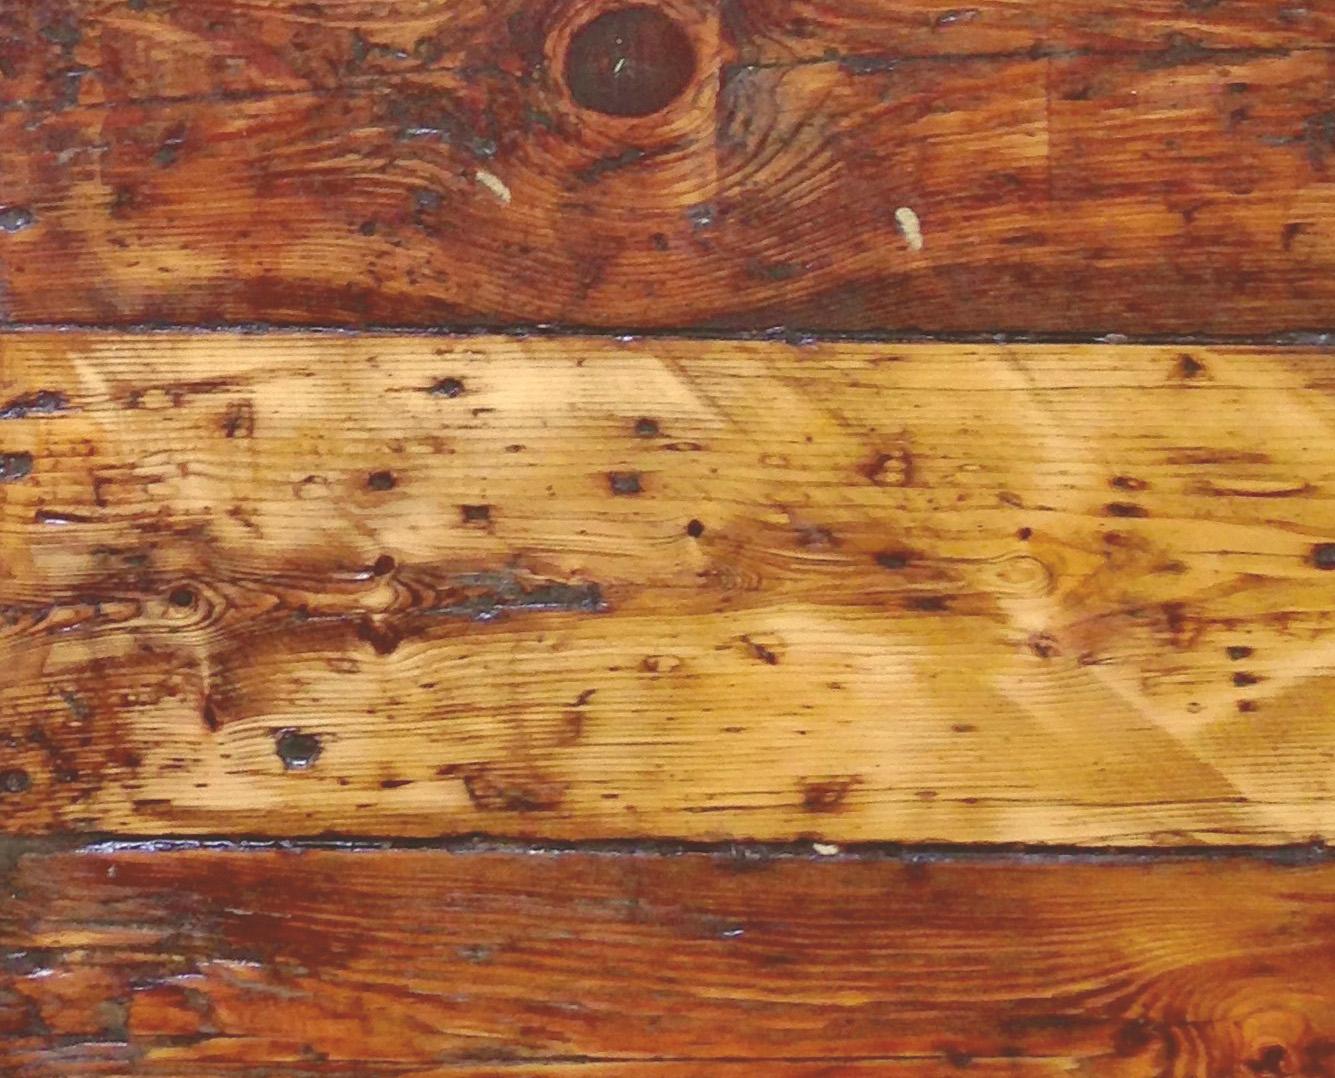 lokation-abb-wood.jpg